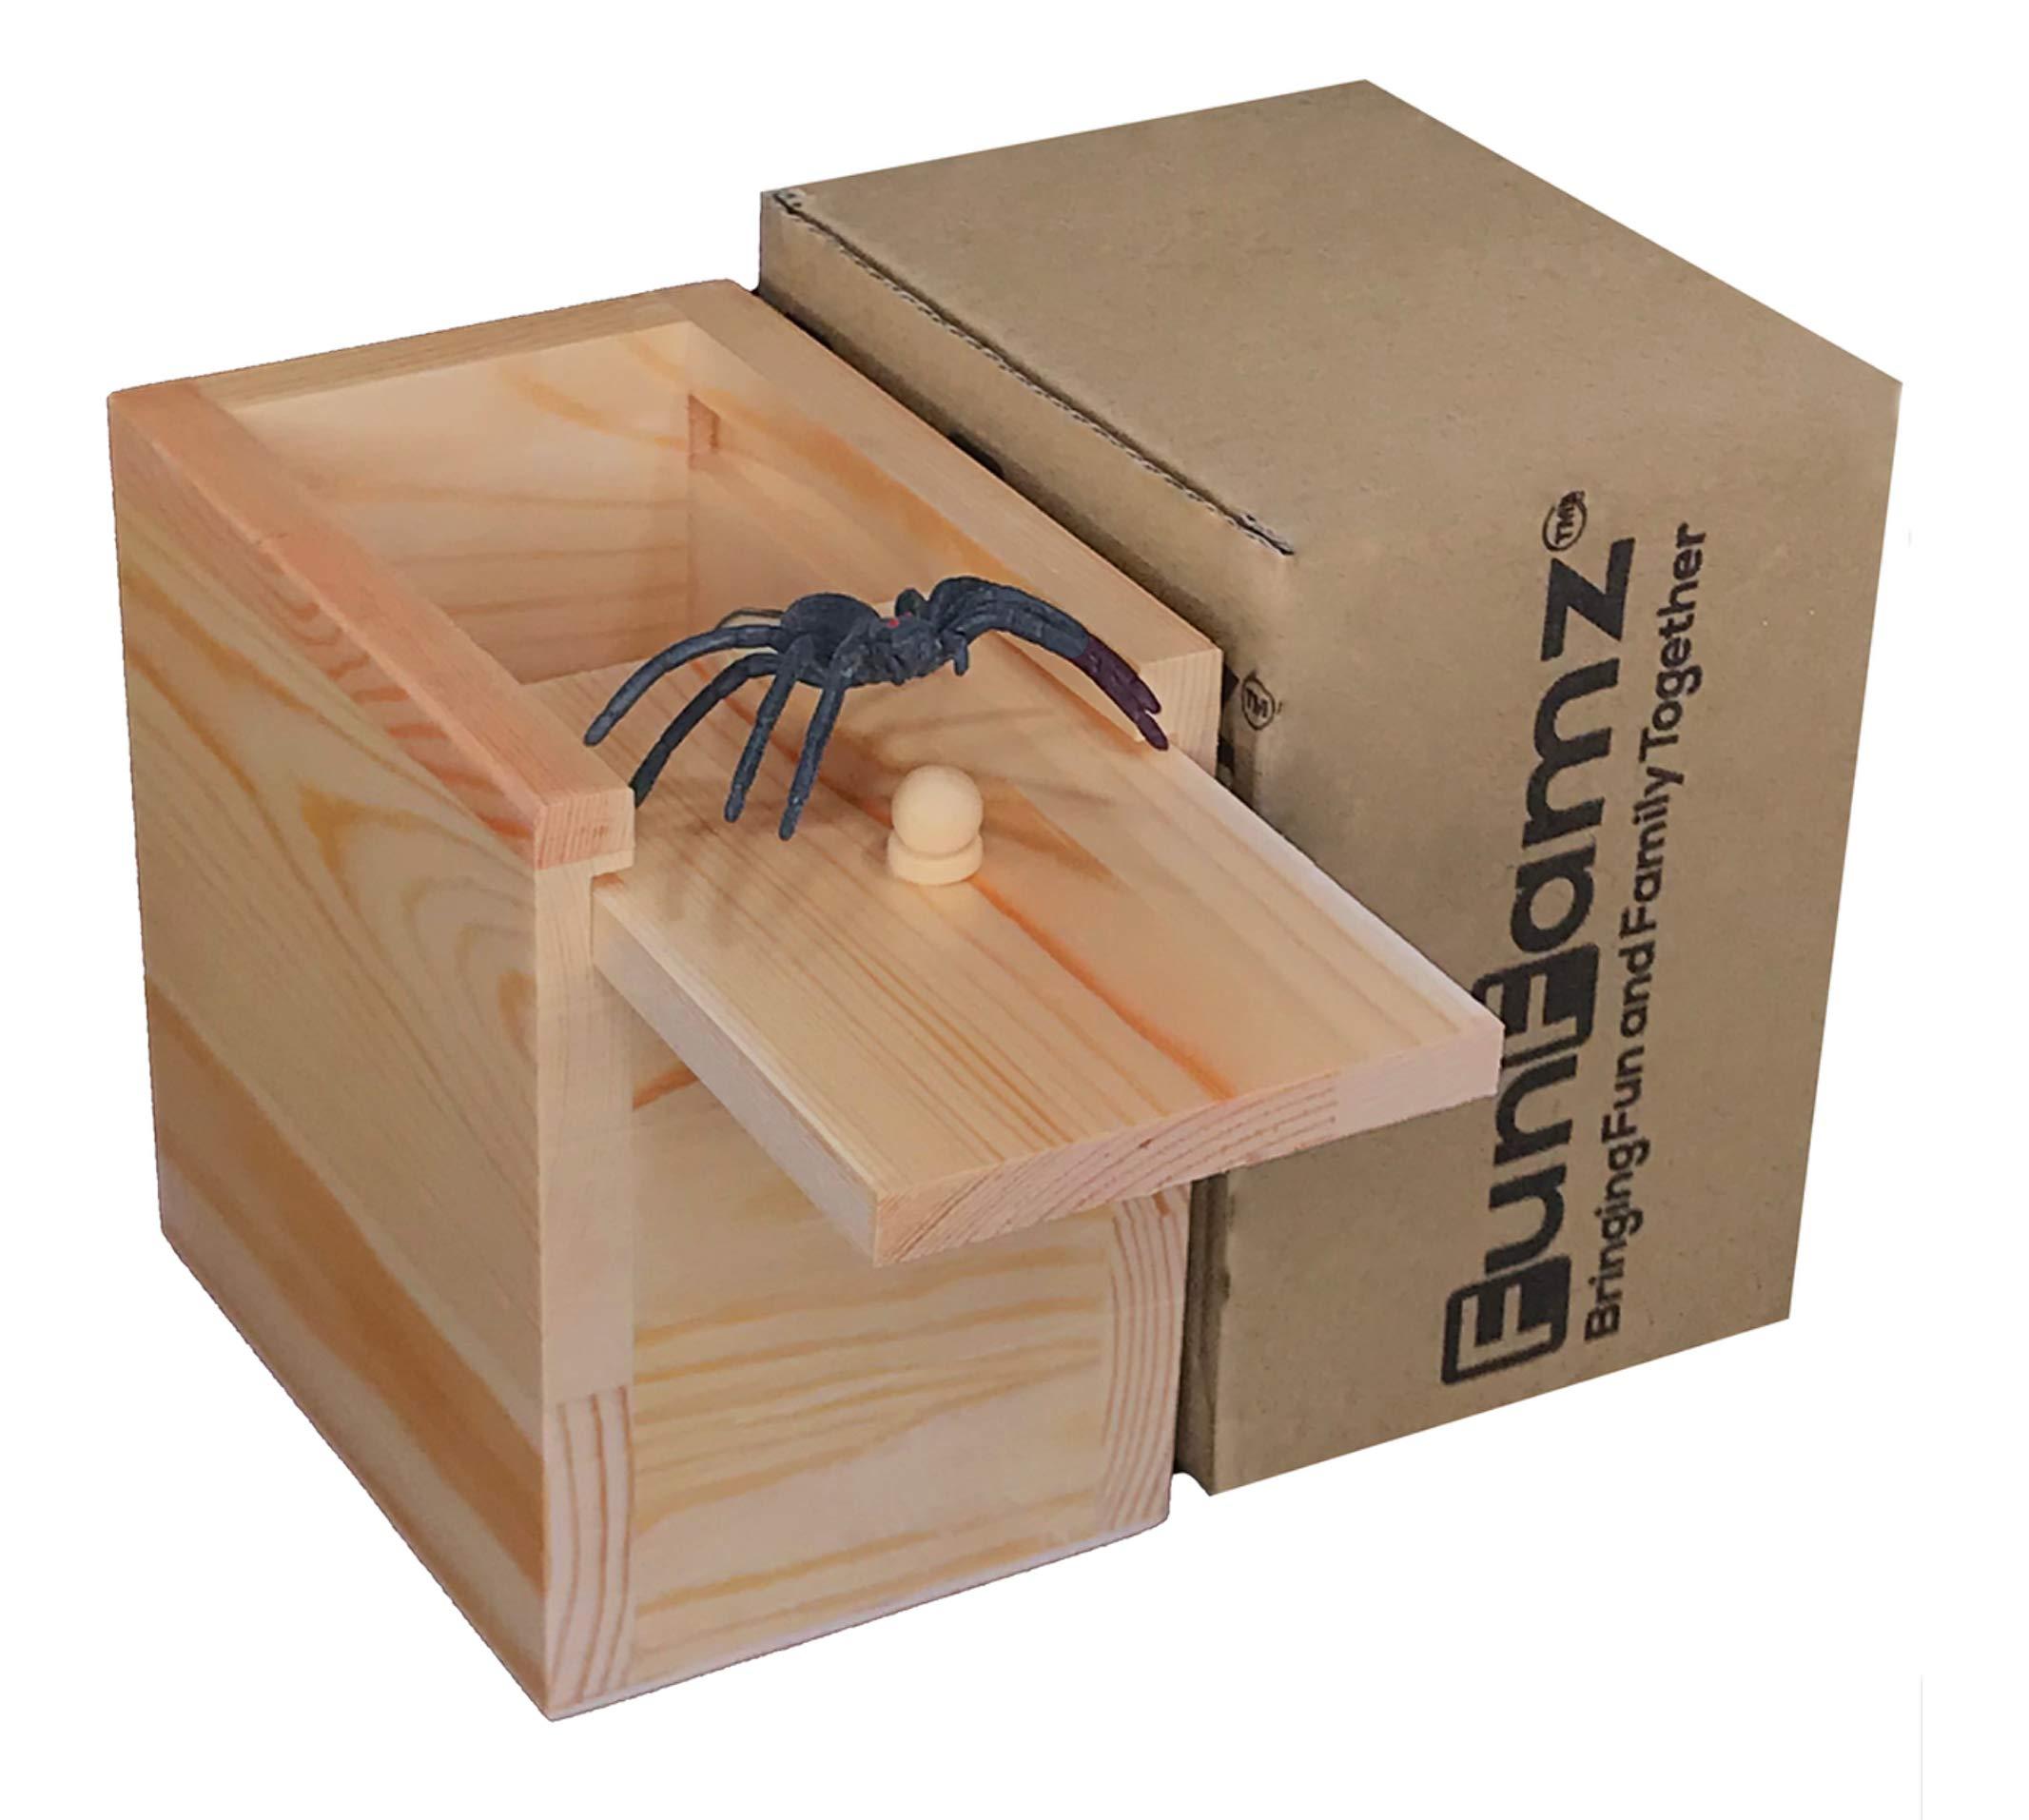 FunFamz The Original Spider Prank Box- Funny Wooden Box Toy Prank, Hilarious Money Gift Box Surprise Toy and Gag Gift Practical Joke by FunFamz